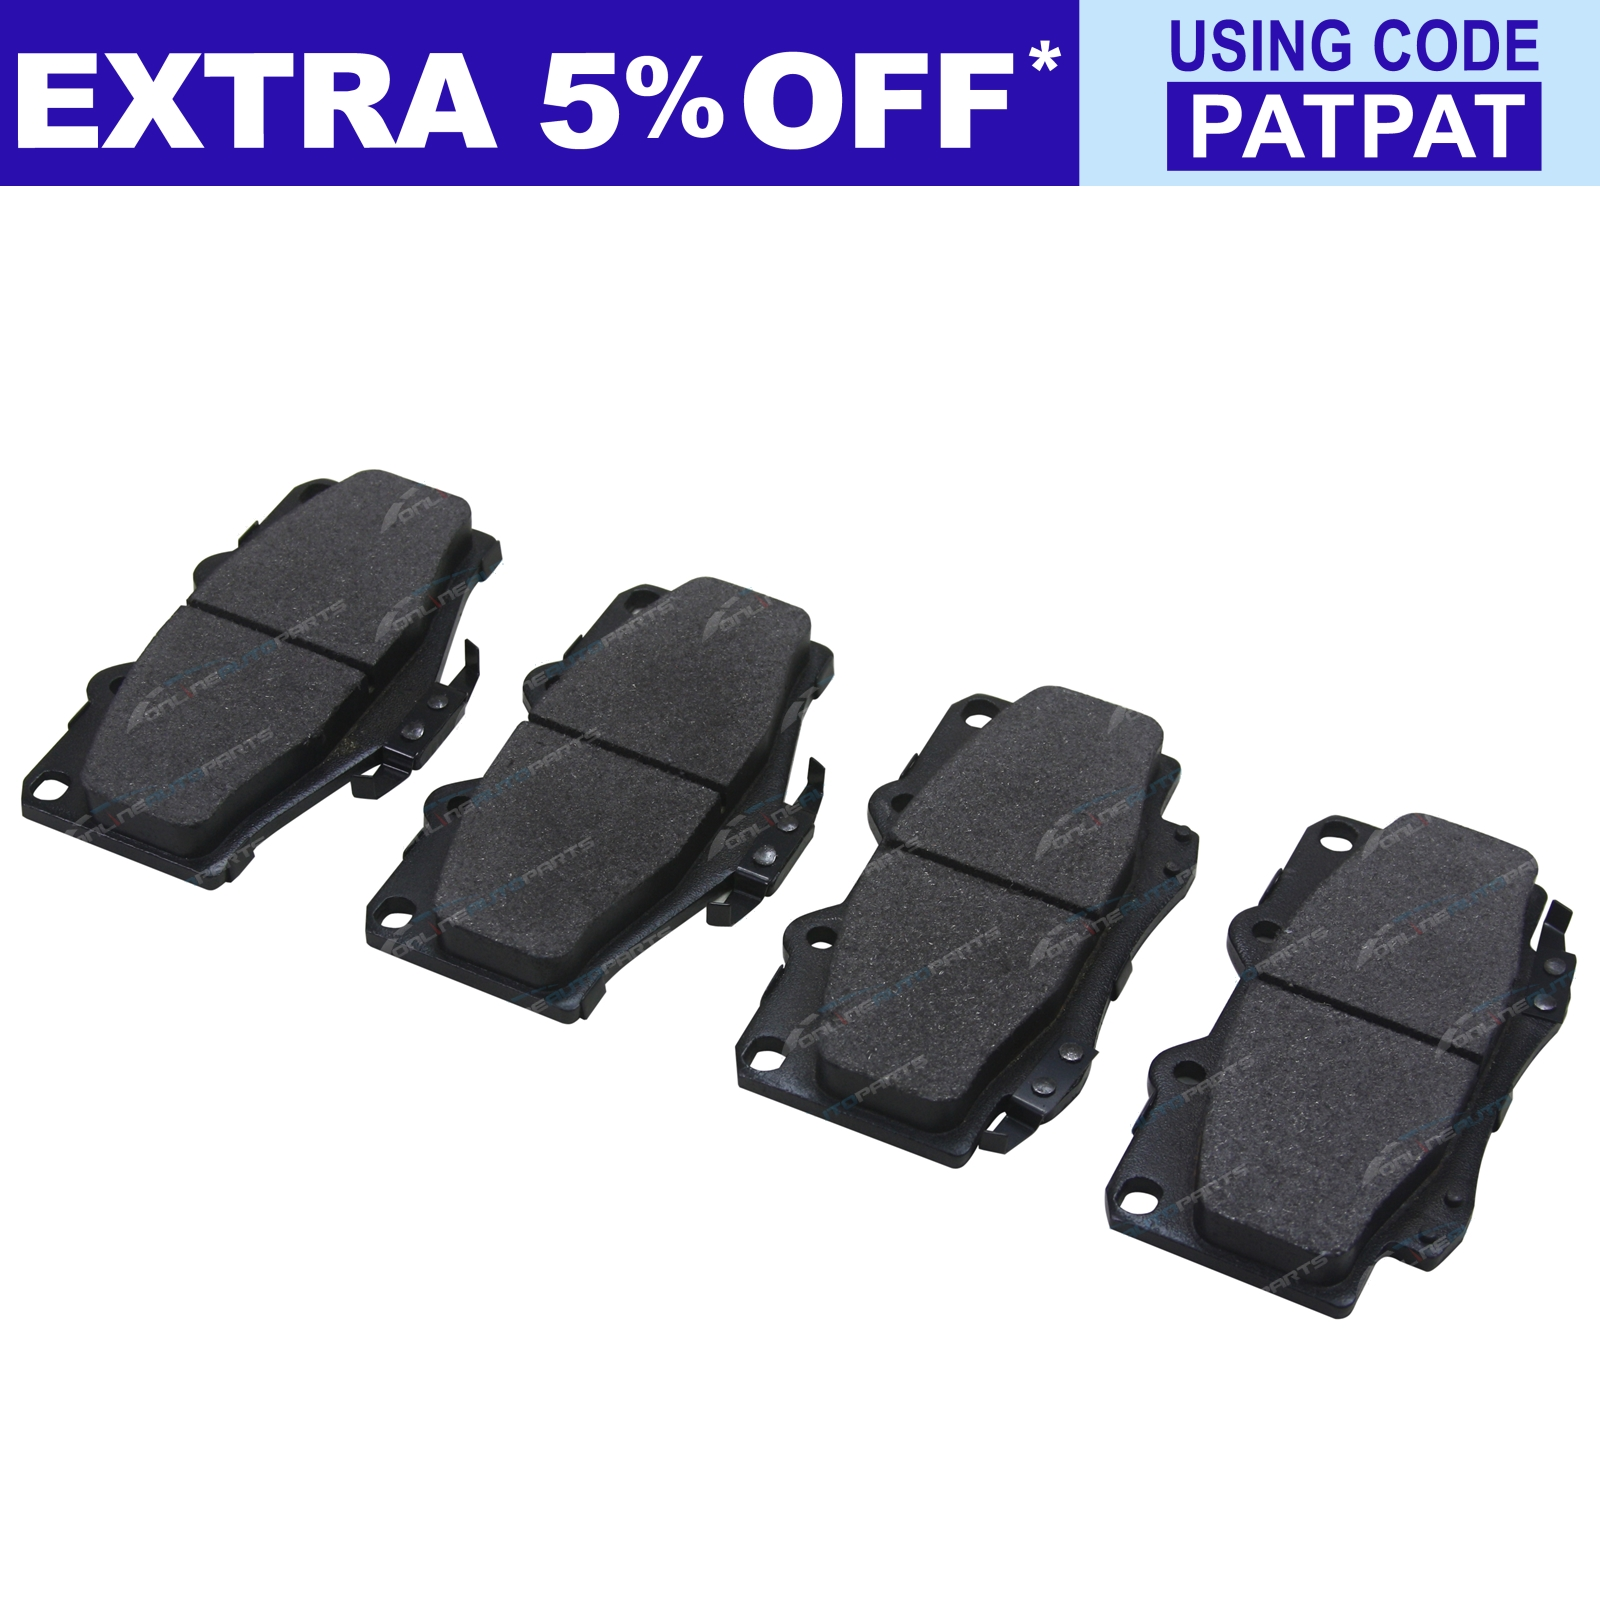 2-Front-Disc-Rotors-Brake-Pad-Set-suits-Landcruiser-1990-1999-70-75-Series-4x4 thumbnail 6